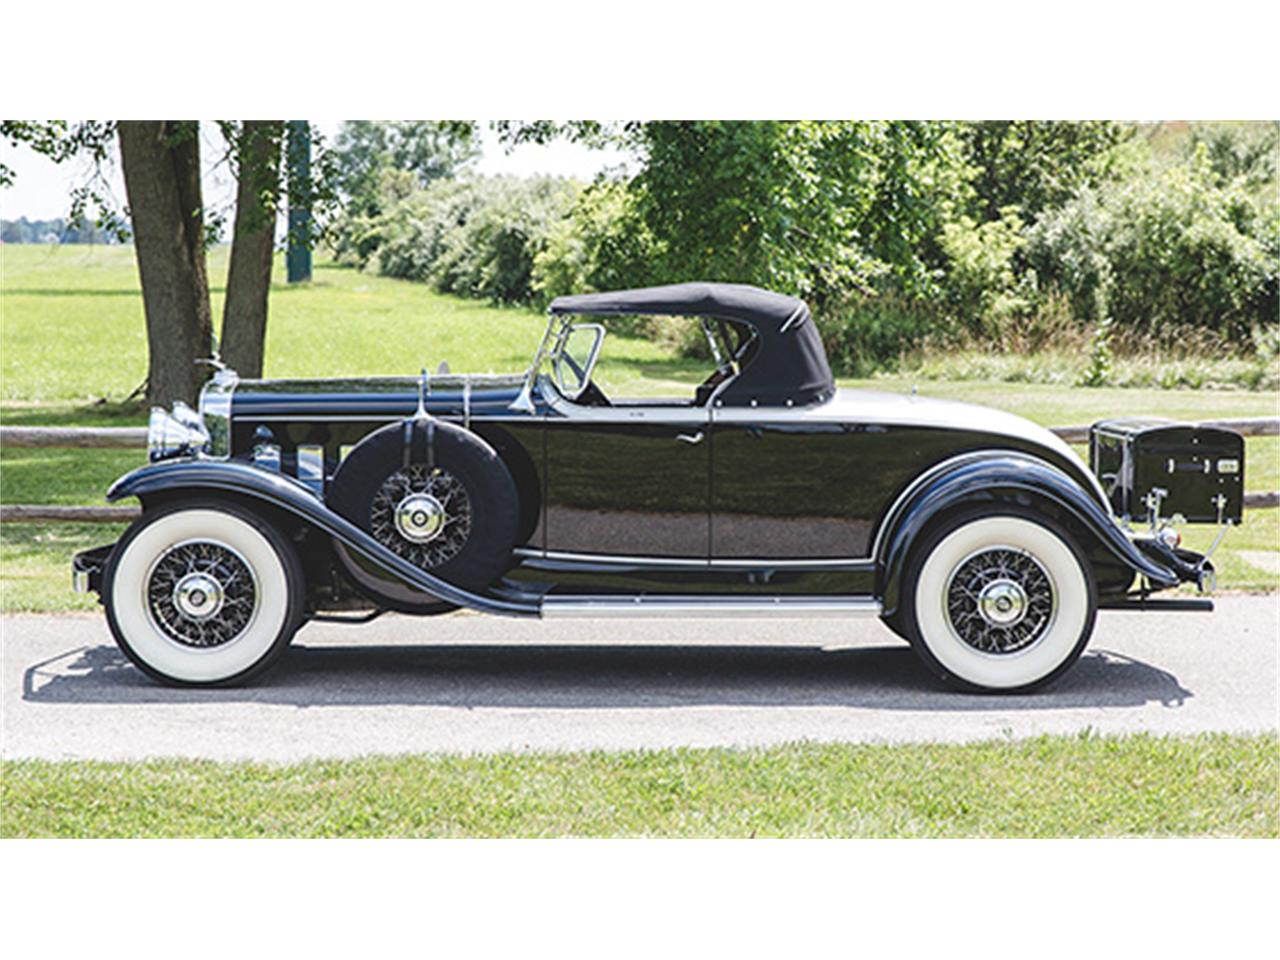 1931 cadillac v 8 roadster by fleetwood for sale cc 1002821. Black Bedroom Furniture Sets. Home Design Ideas